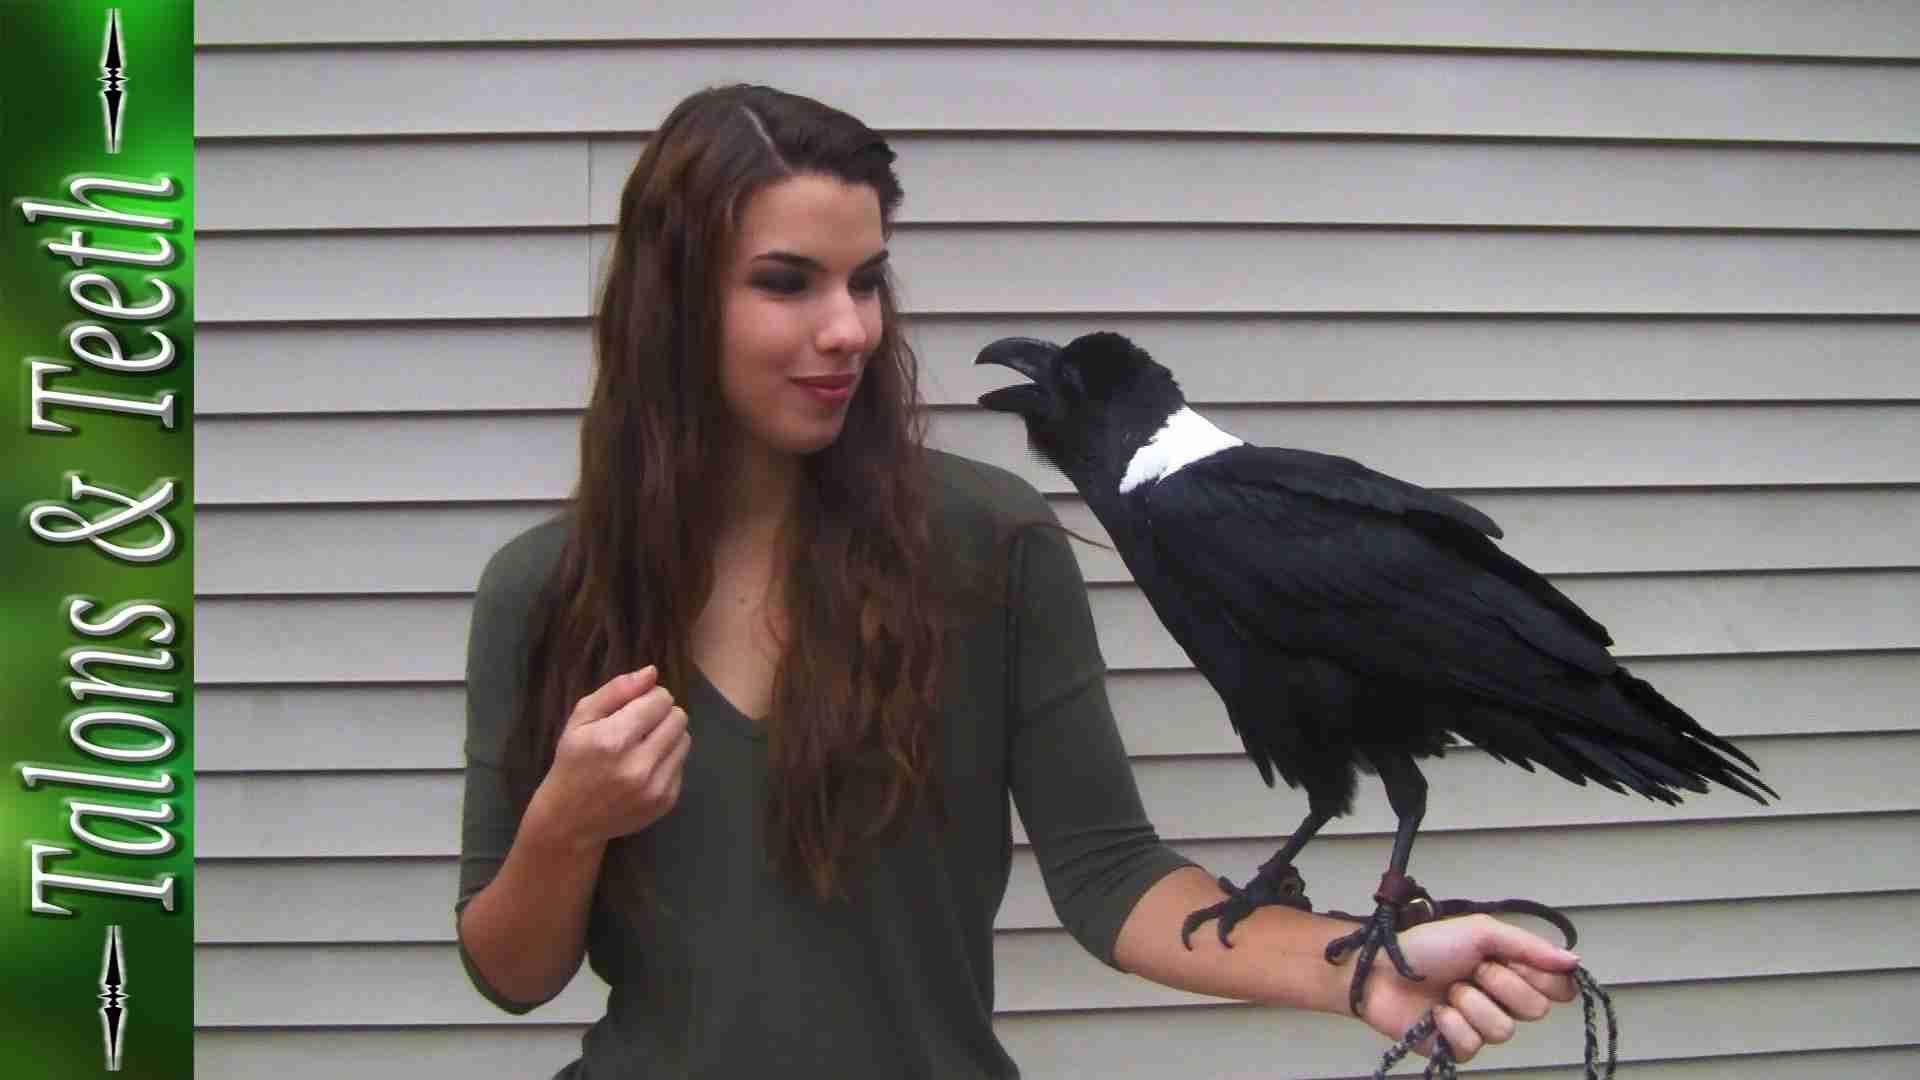 Ravens can talk! - YouTube